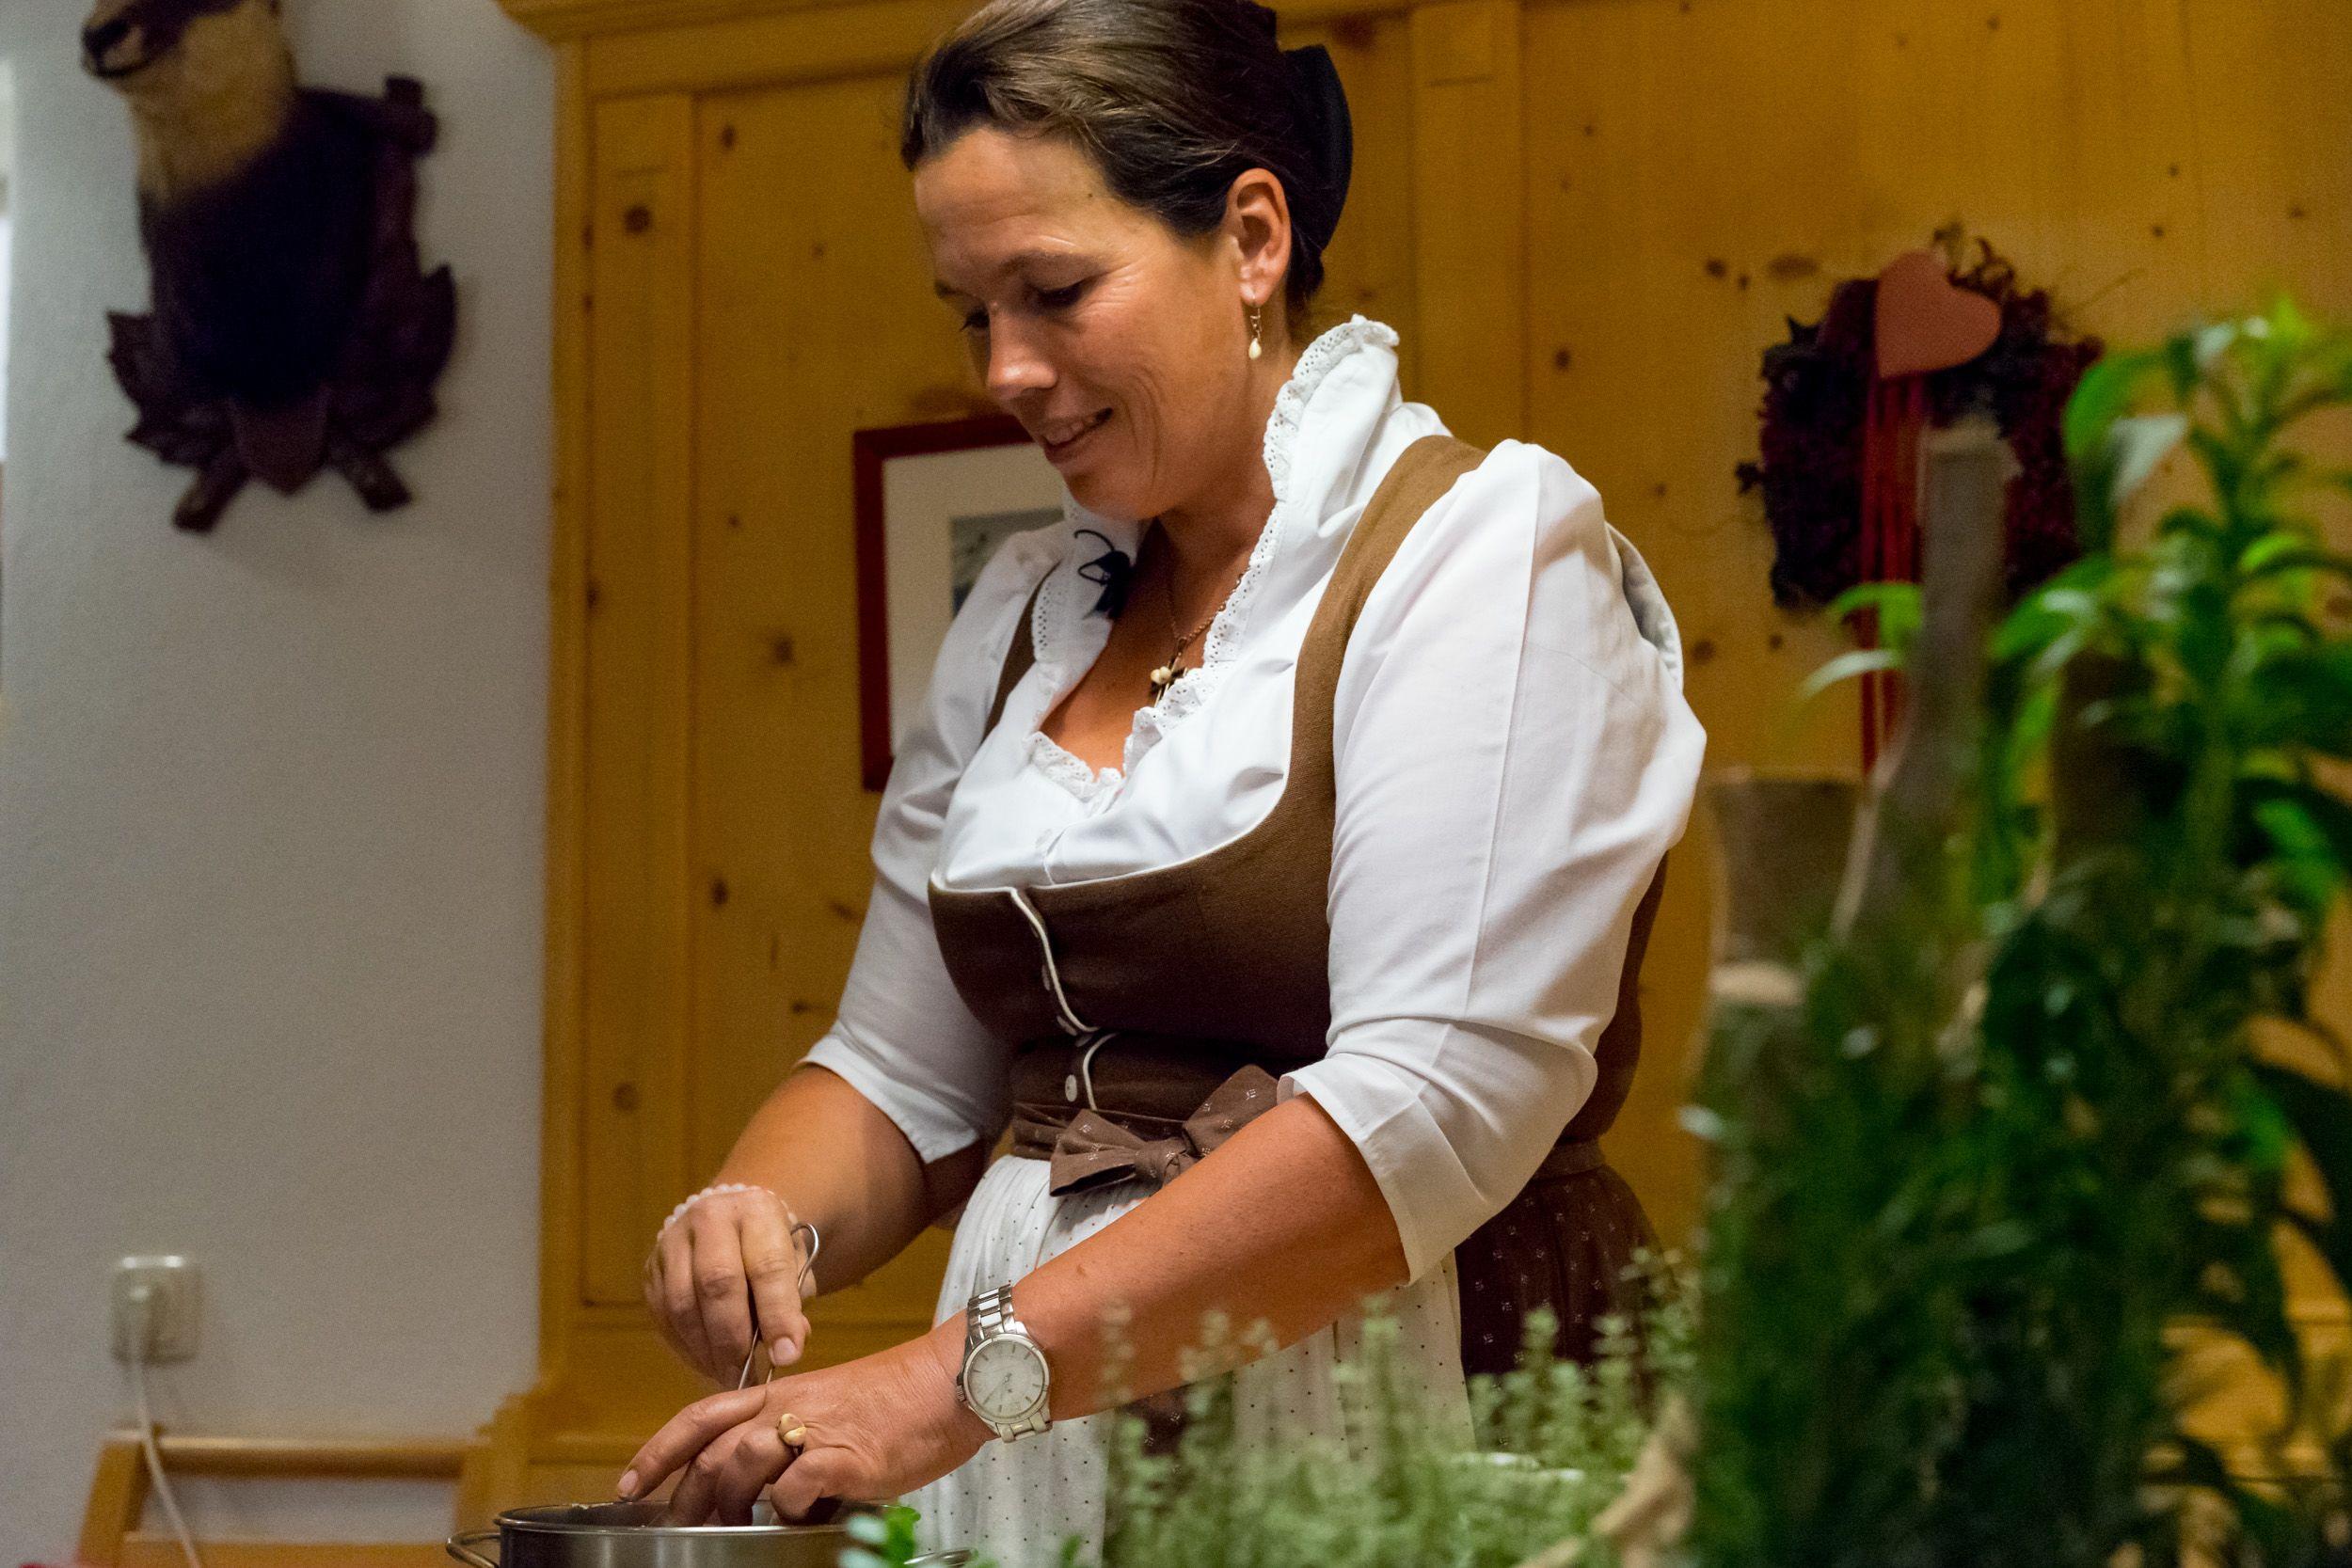 Kräuterworkshop mit Susi